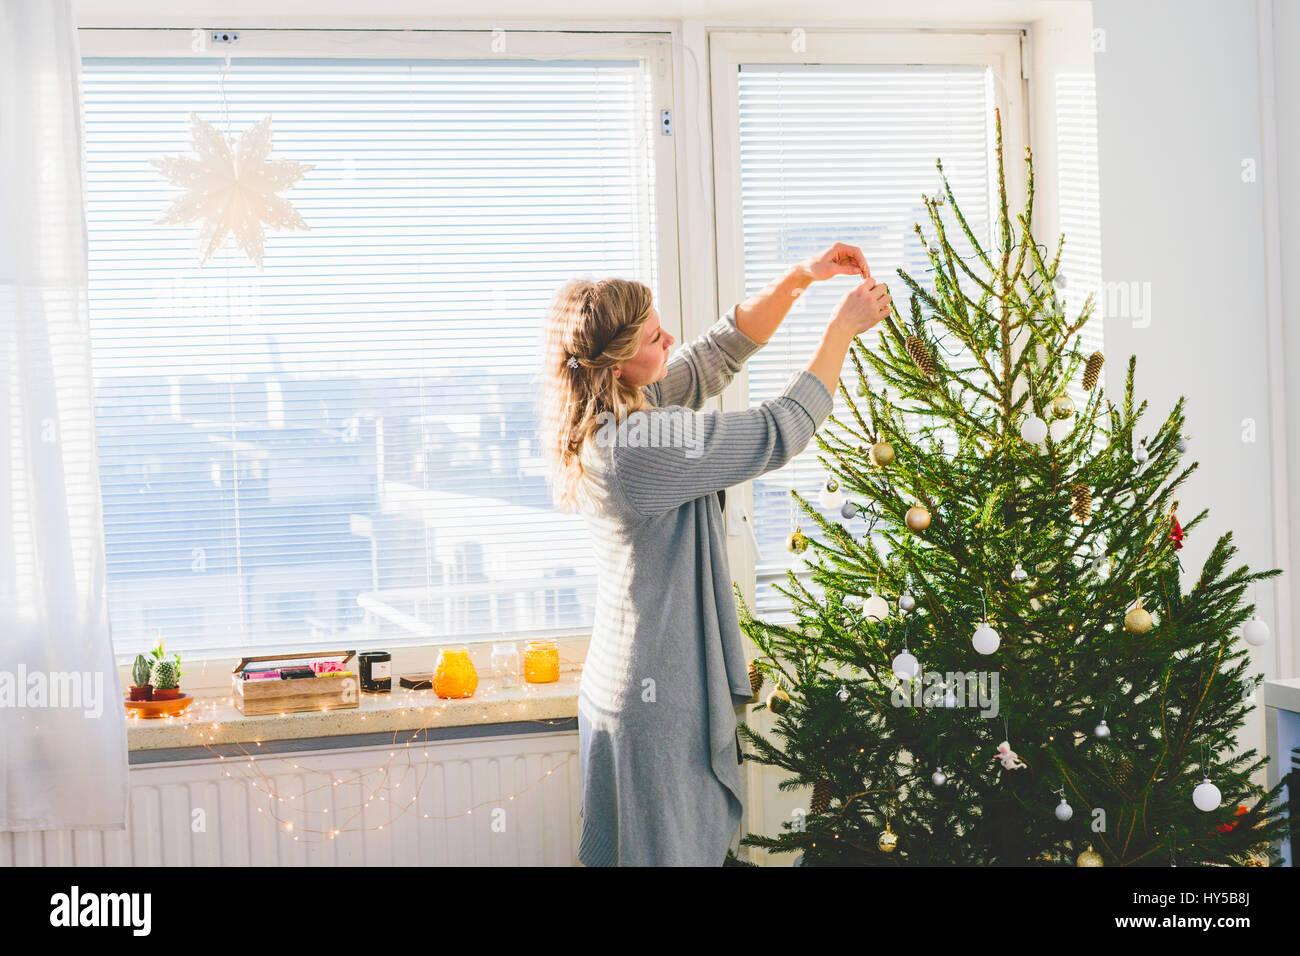 Finlandia, Helsinki, mujer decorar árbol de navidad Imagen De Stock